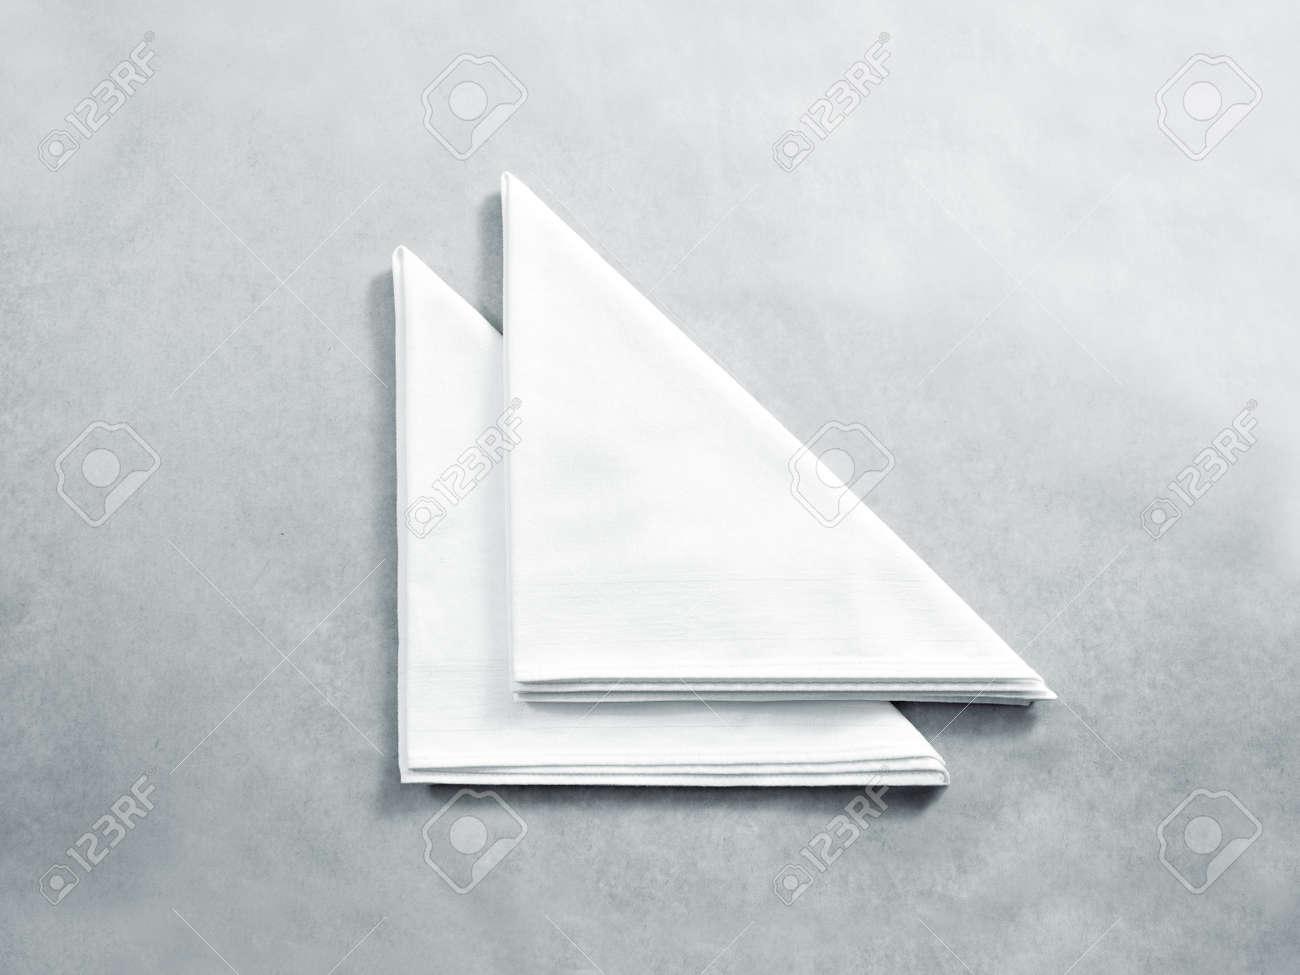 Blank white restaurant napkin mock up, isolated  Clear folded